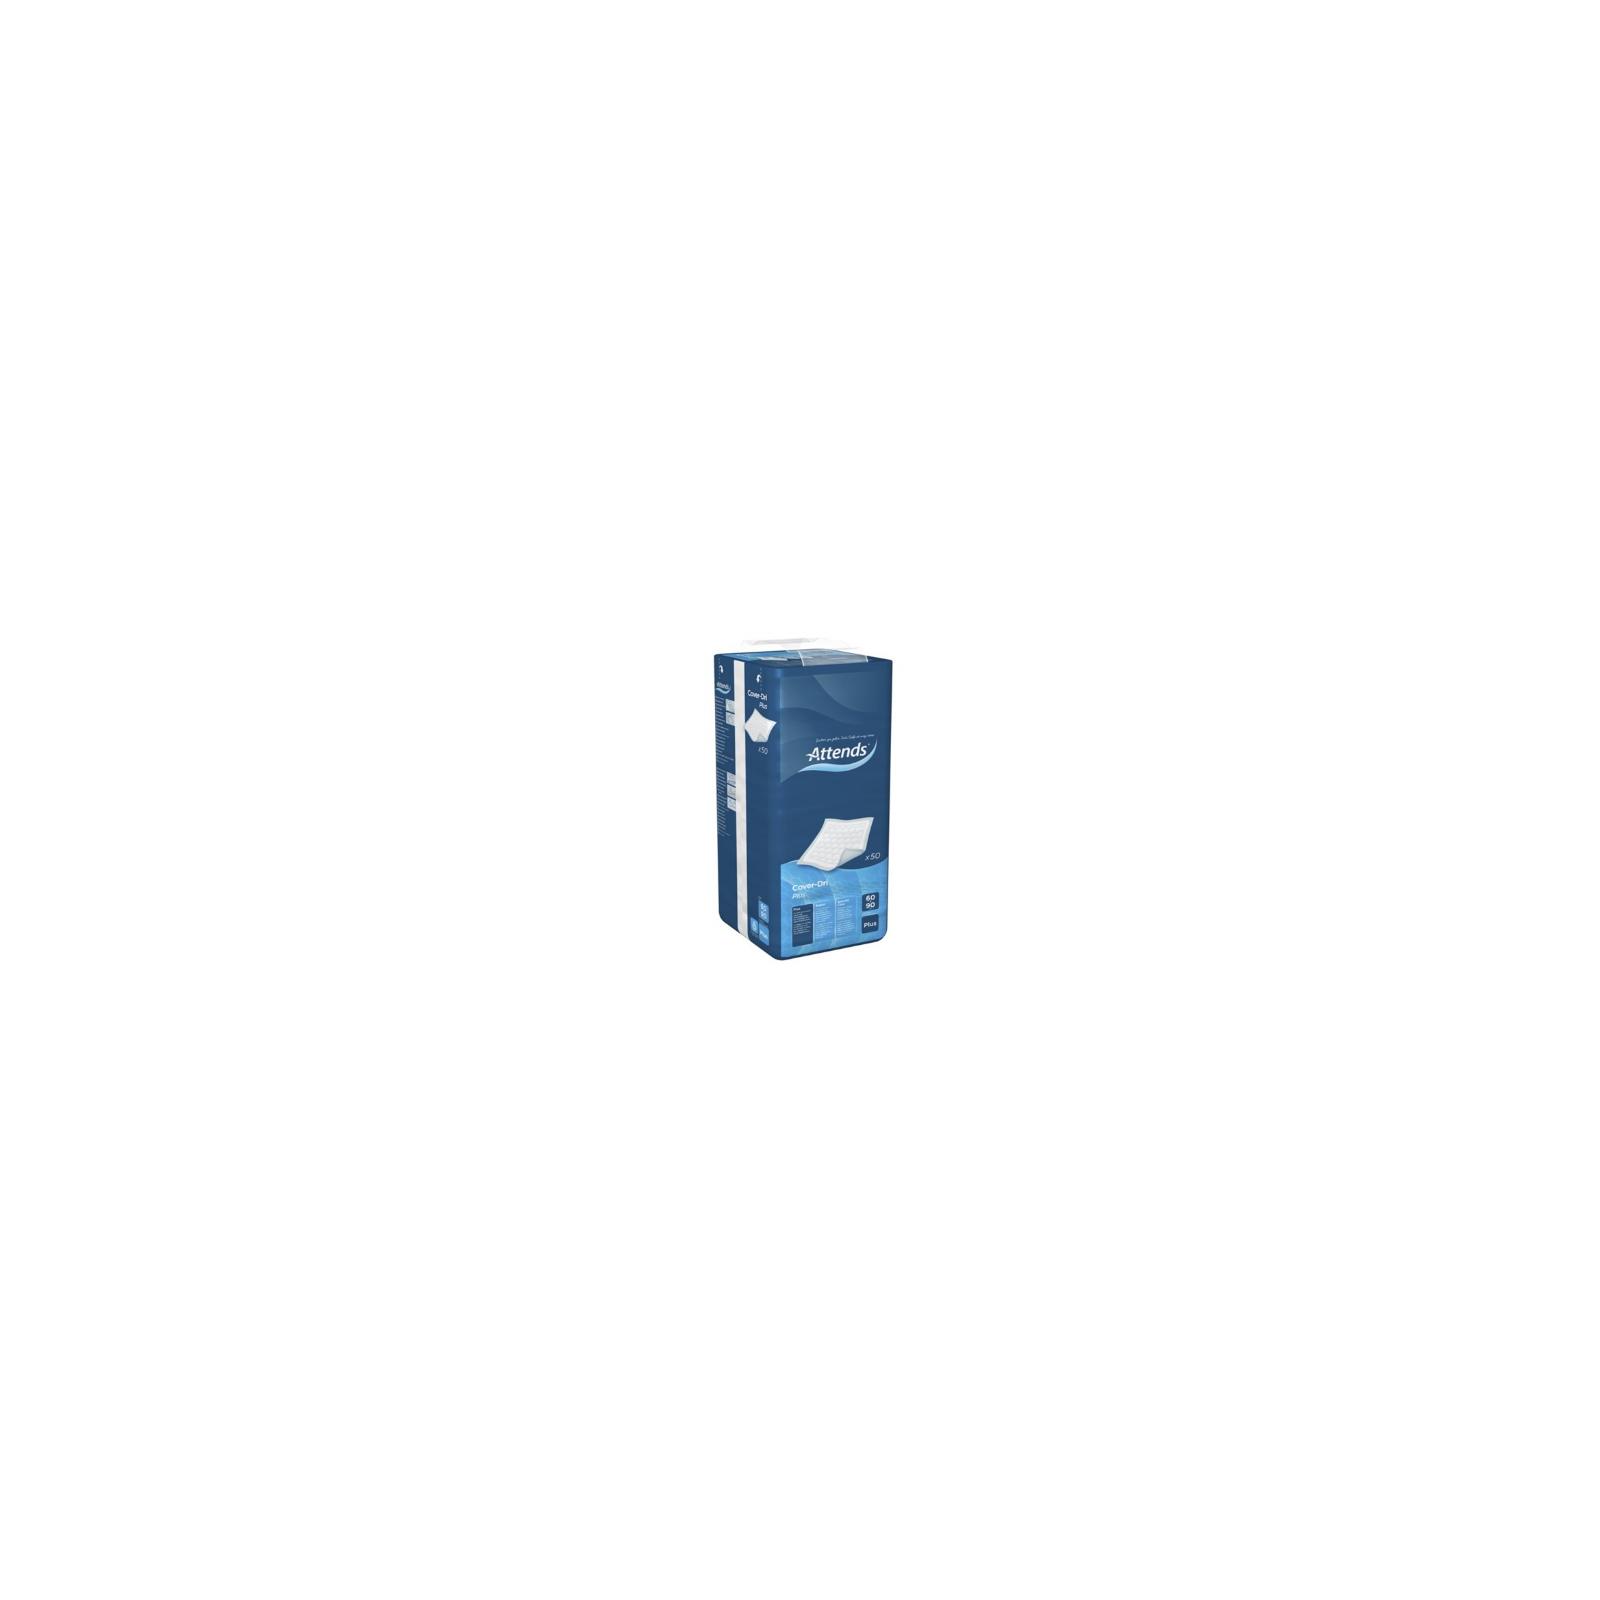 Attends Cover-Dri Plus 60 x 90 cm| SenUp.com